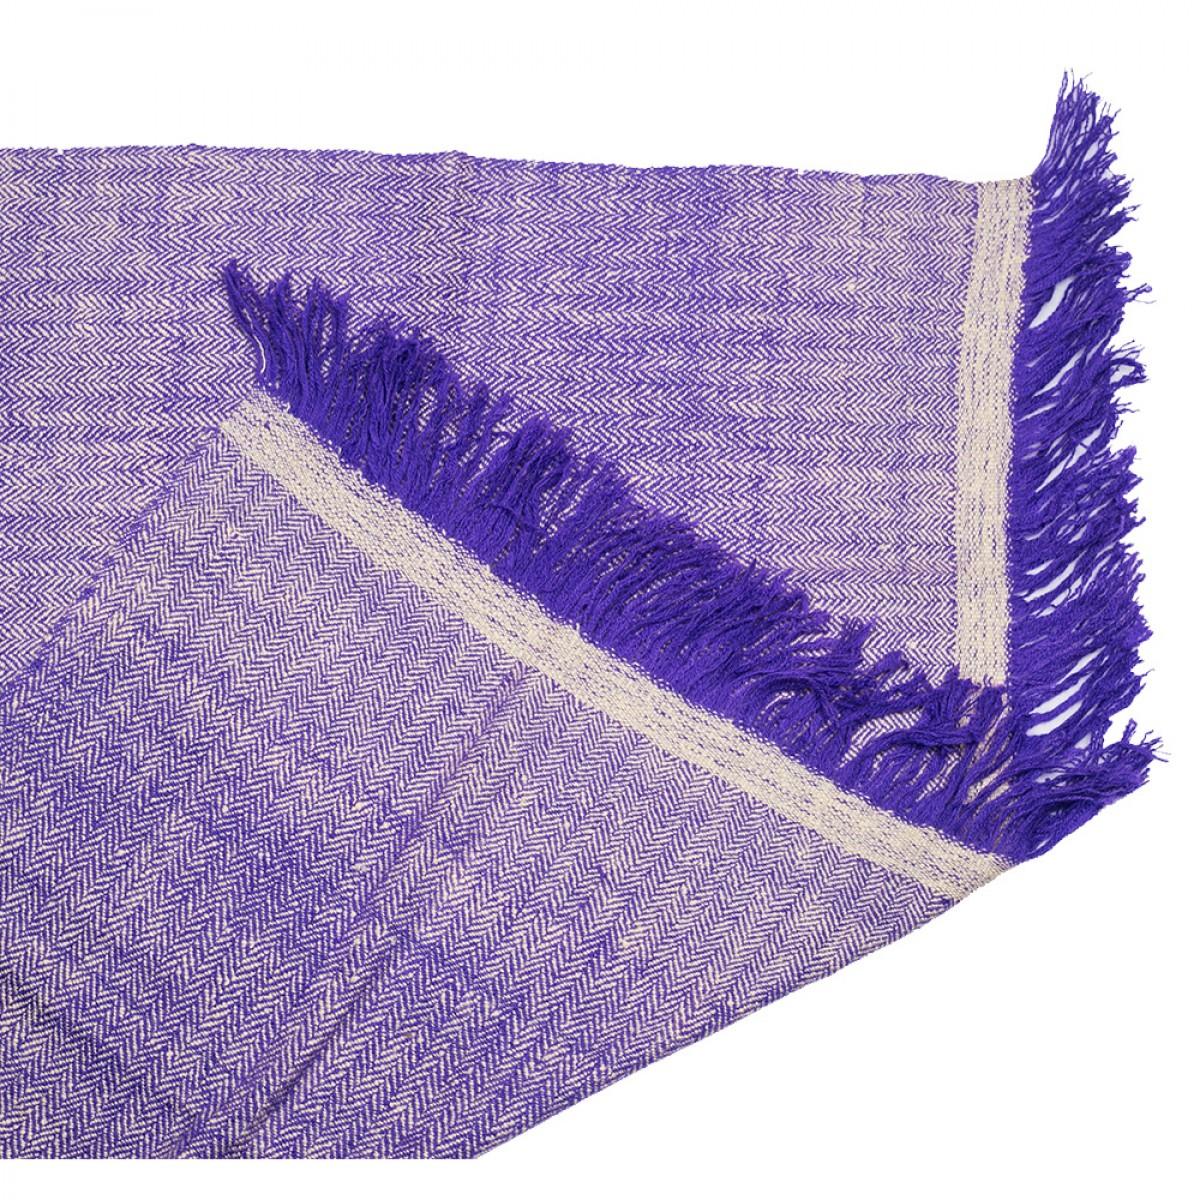 Blue Herringbone Weave Baby Cashmere Blanket